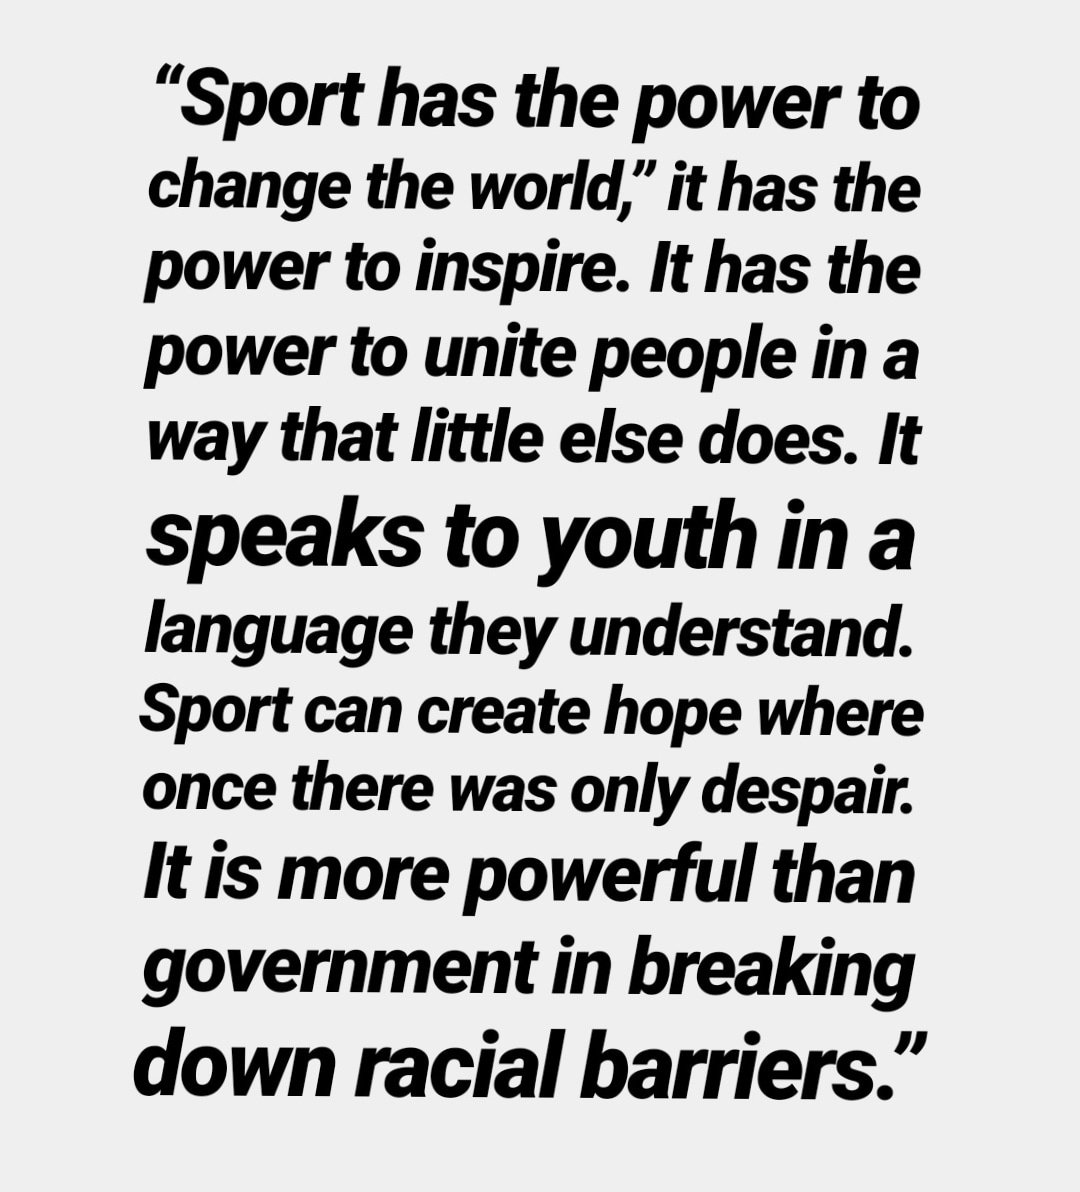 Being a #SportsLover and as it's #NelsonMandelaDay 👇 here's his quote that defines sports the best.....@NelsonMandela @Africasports @africasport @sportstarweb @FirstpostSports @HTSportsNews @ddsportschannel @IndiaSports @StarSportsIndia @toisports